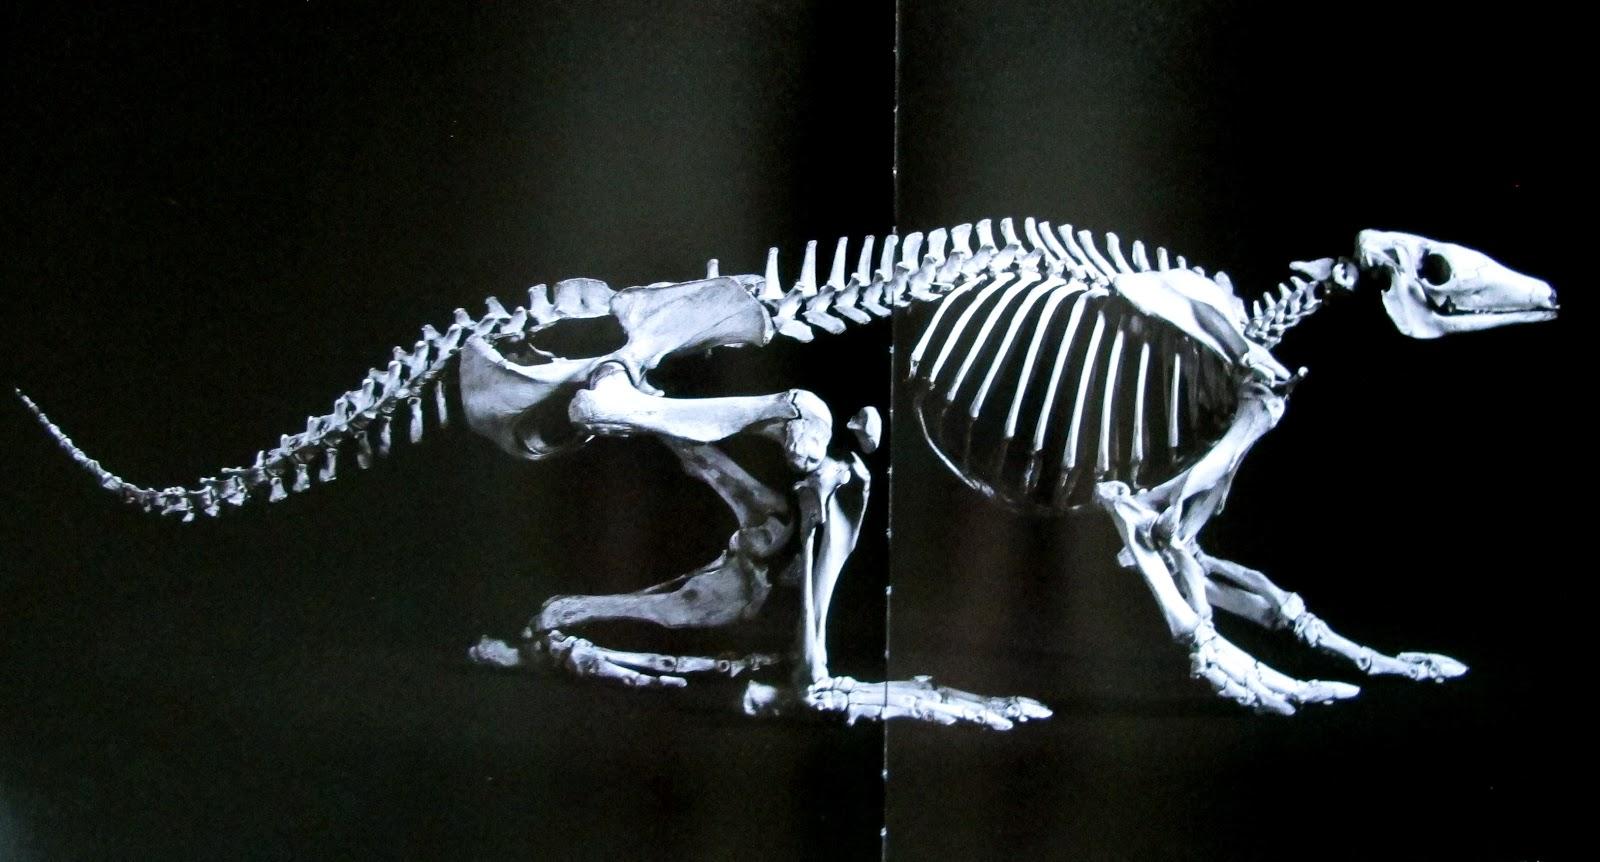 Aardvark skeleton - photo#6